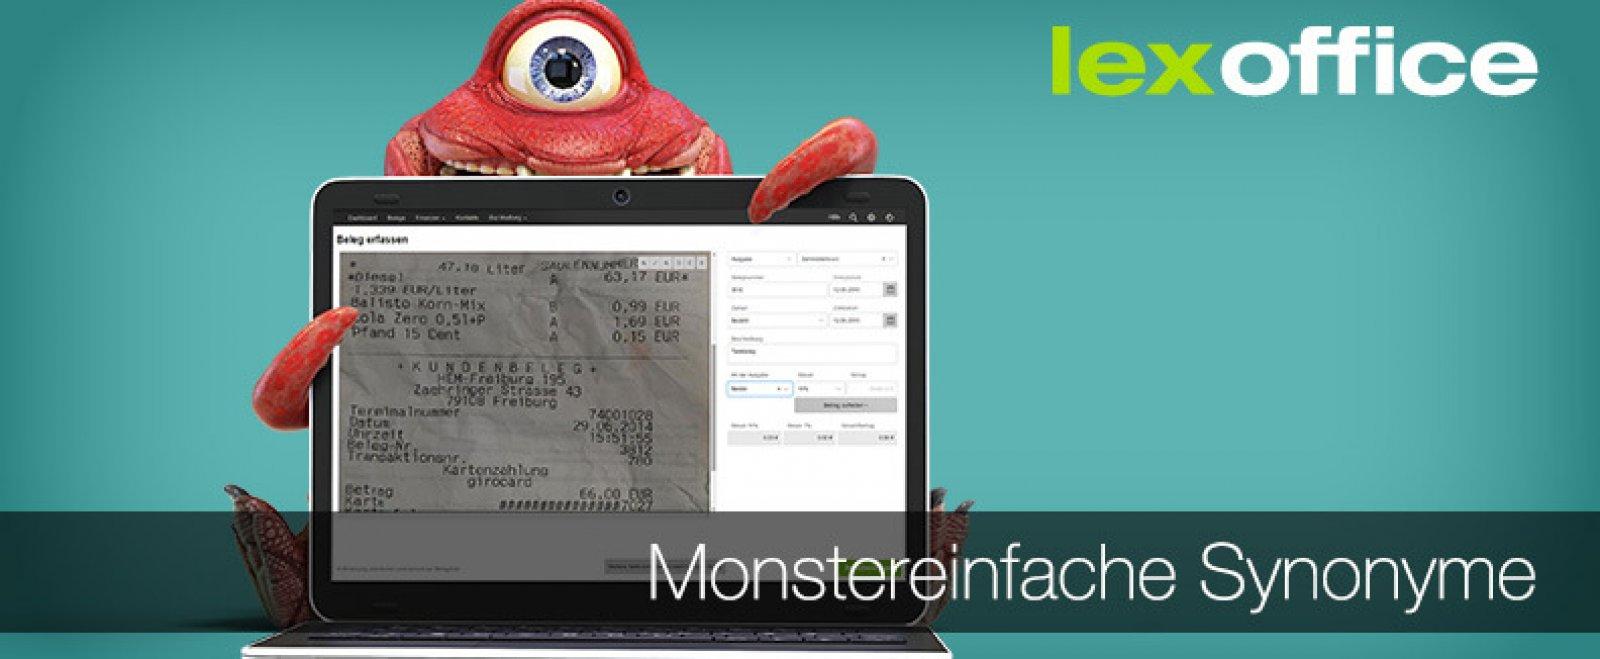 Lexoffice Release Monstereinfache Synonyme Bei Lexoffice